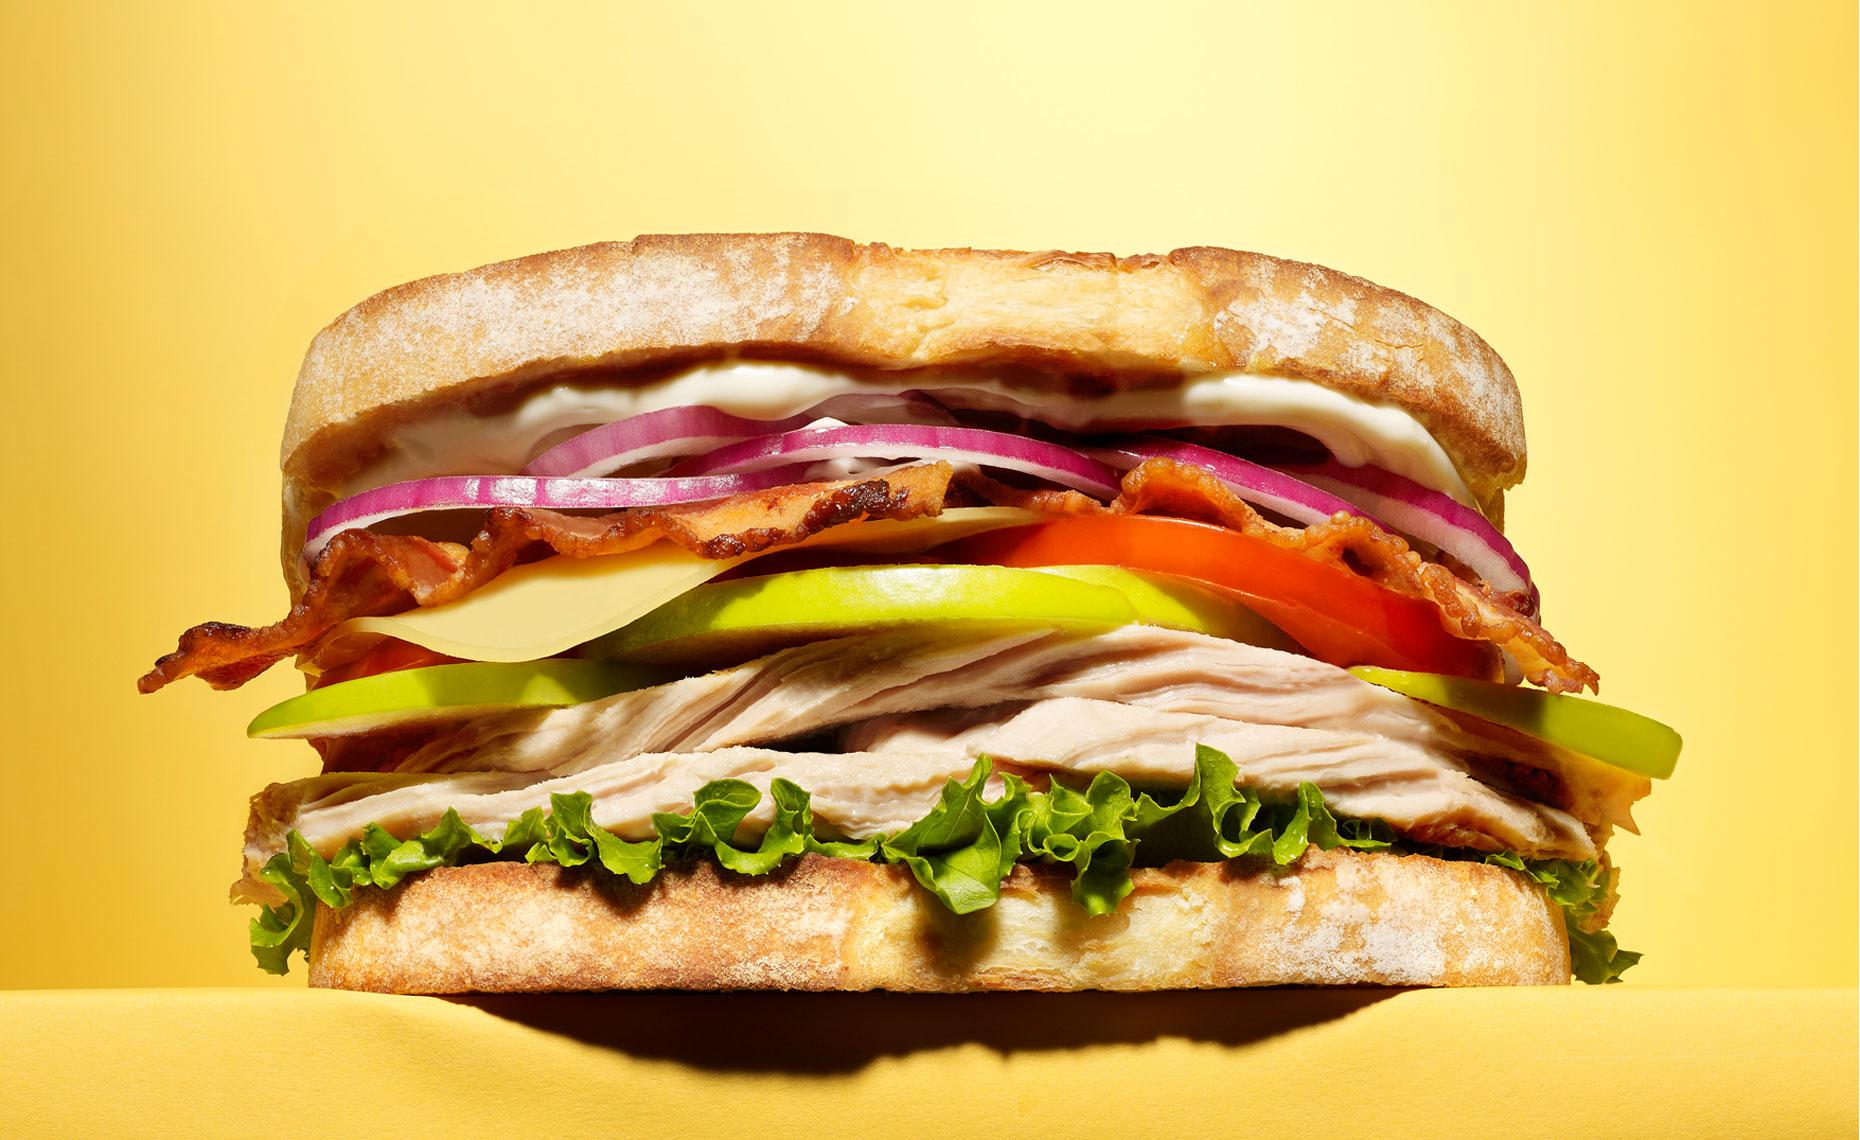 lisa-sandwich-resized.jpg